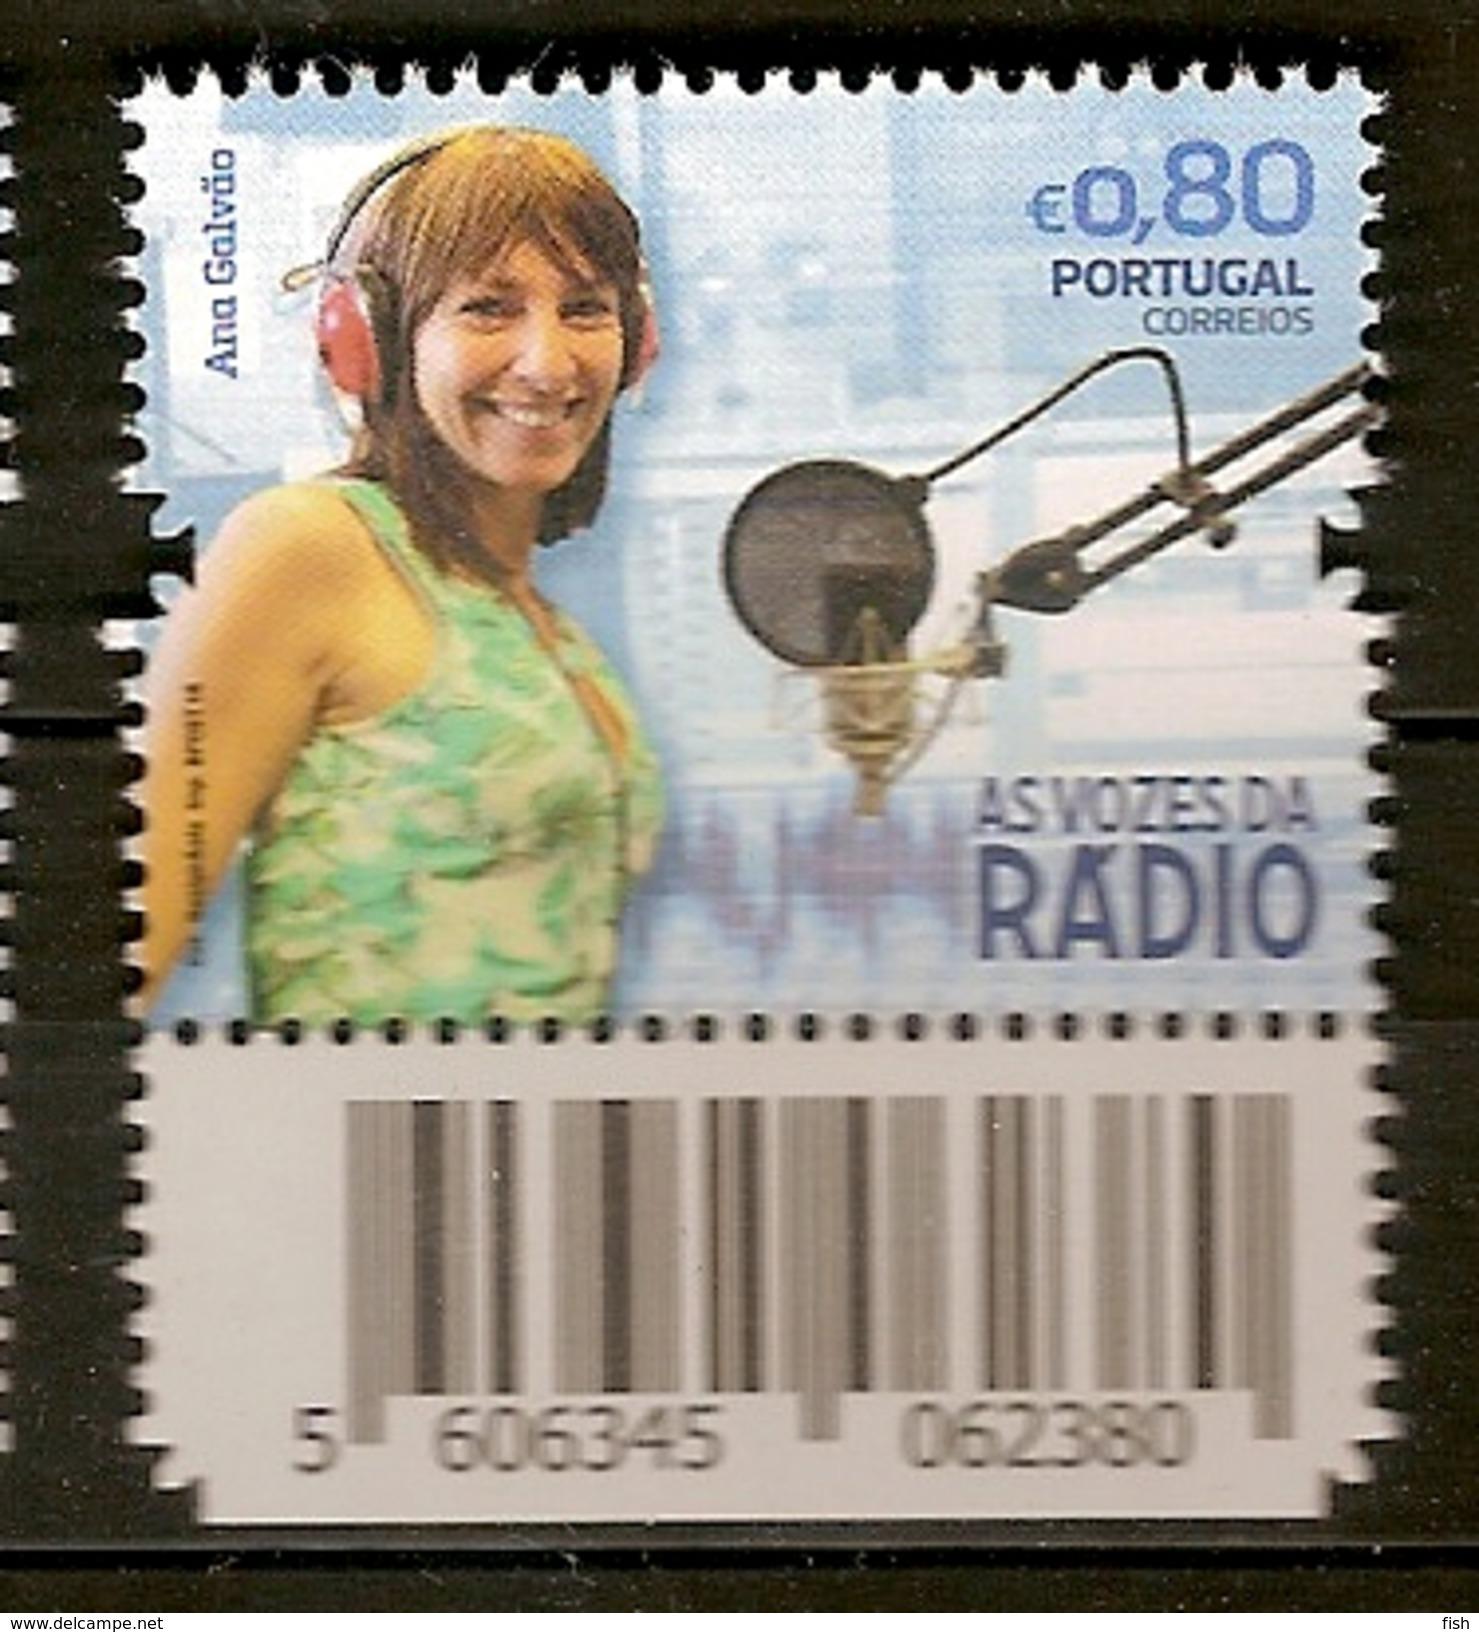 Portugal ** & The Voices Of The Portuguese Radio, Ana Galvão 2016 (6868Barras) - Jobs